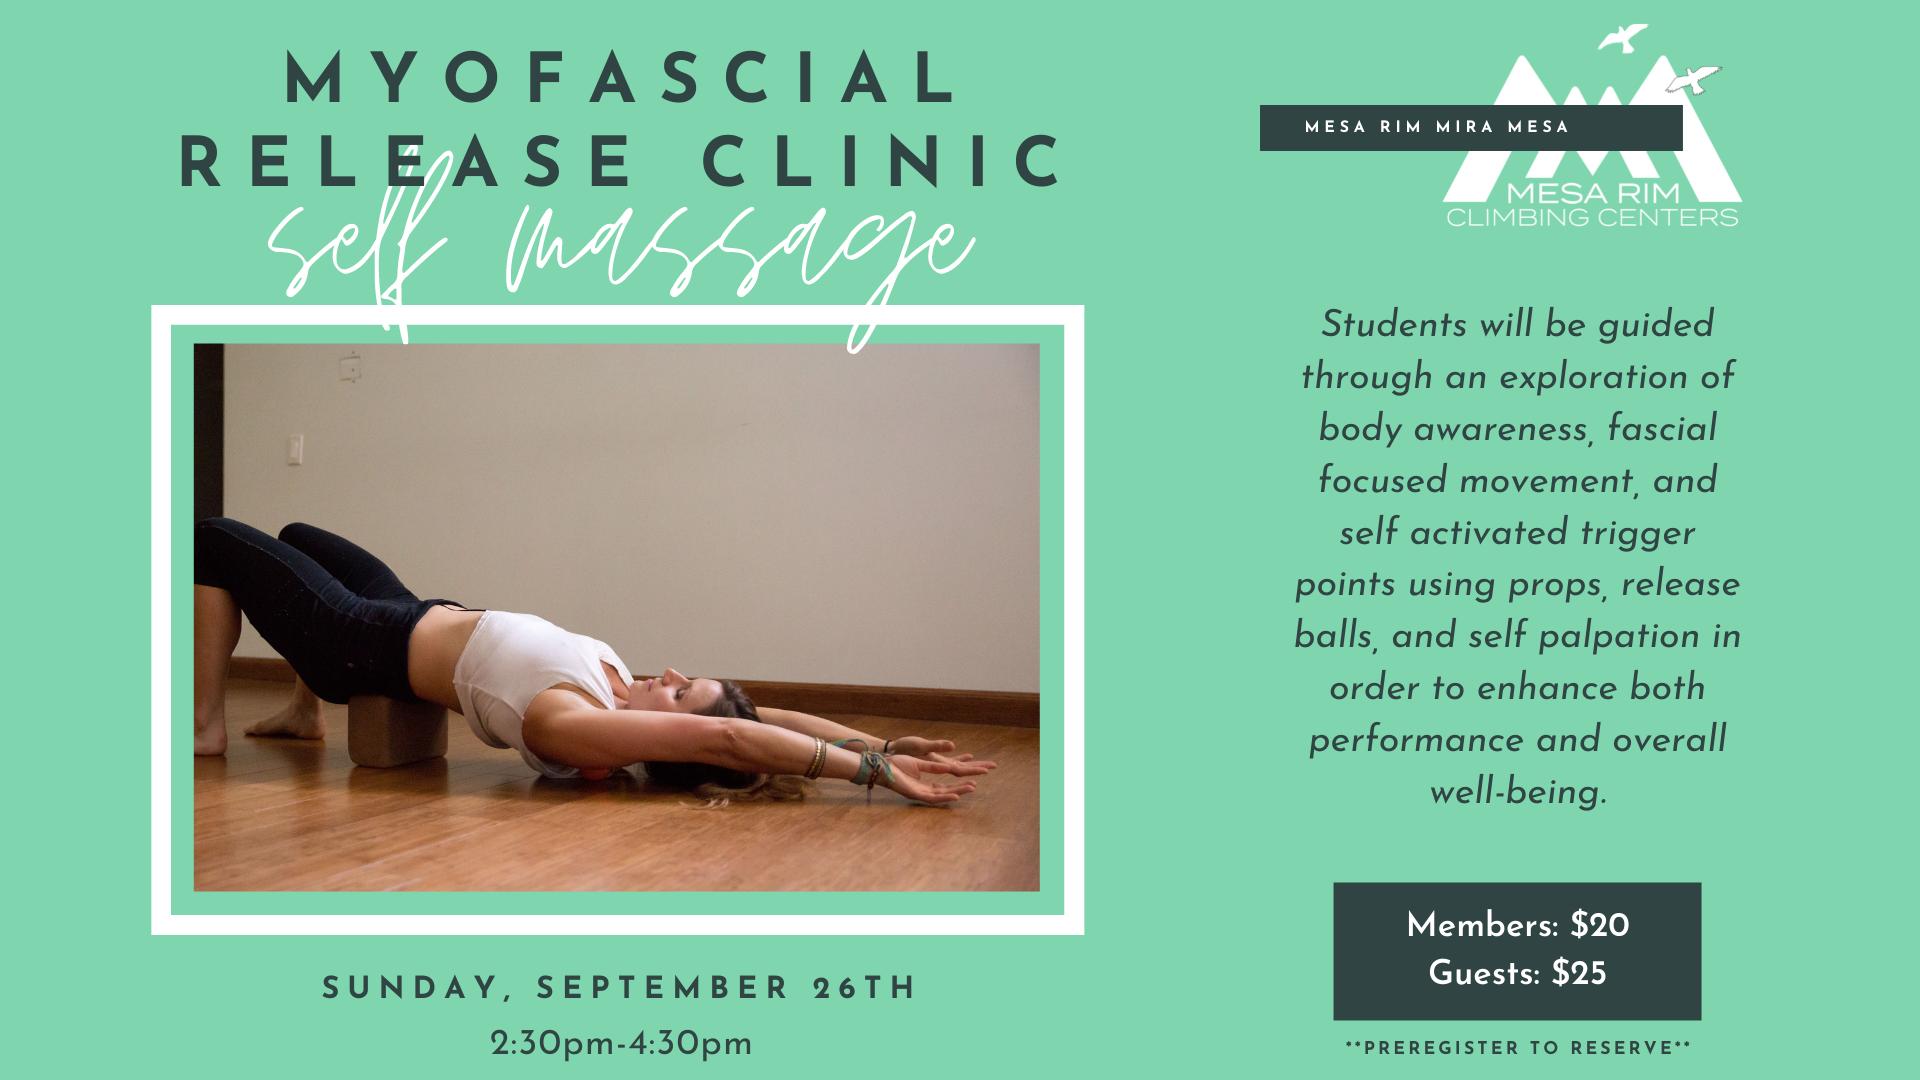 Myofascial Release Clinic